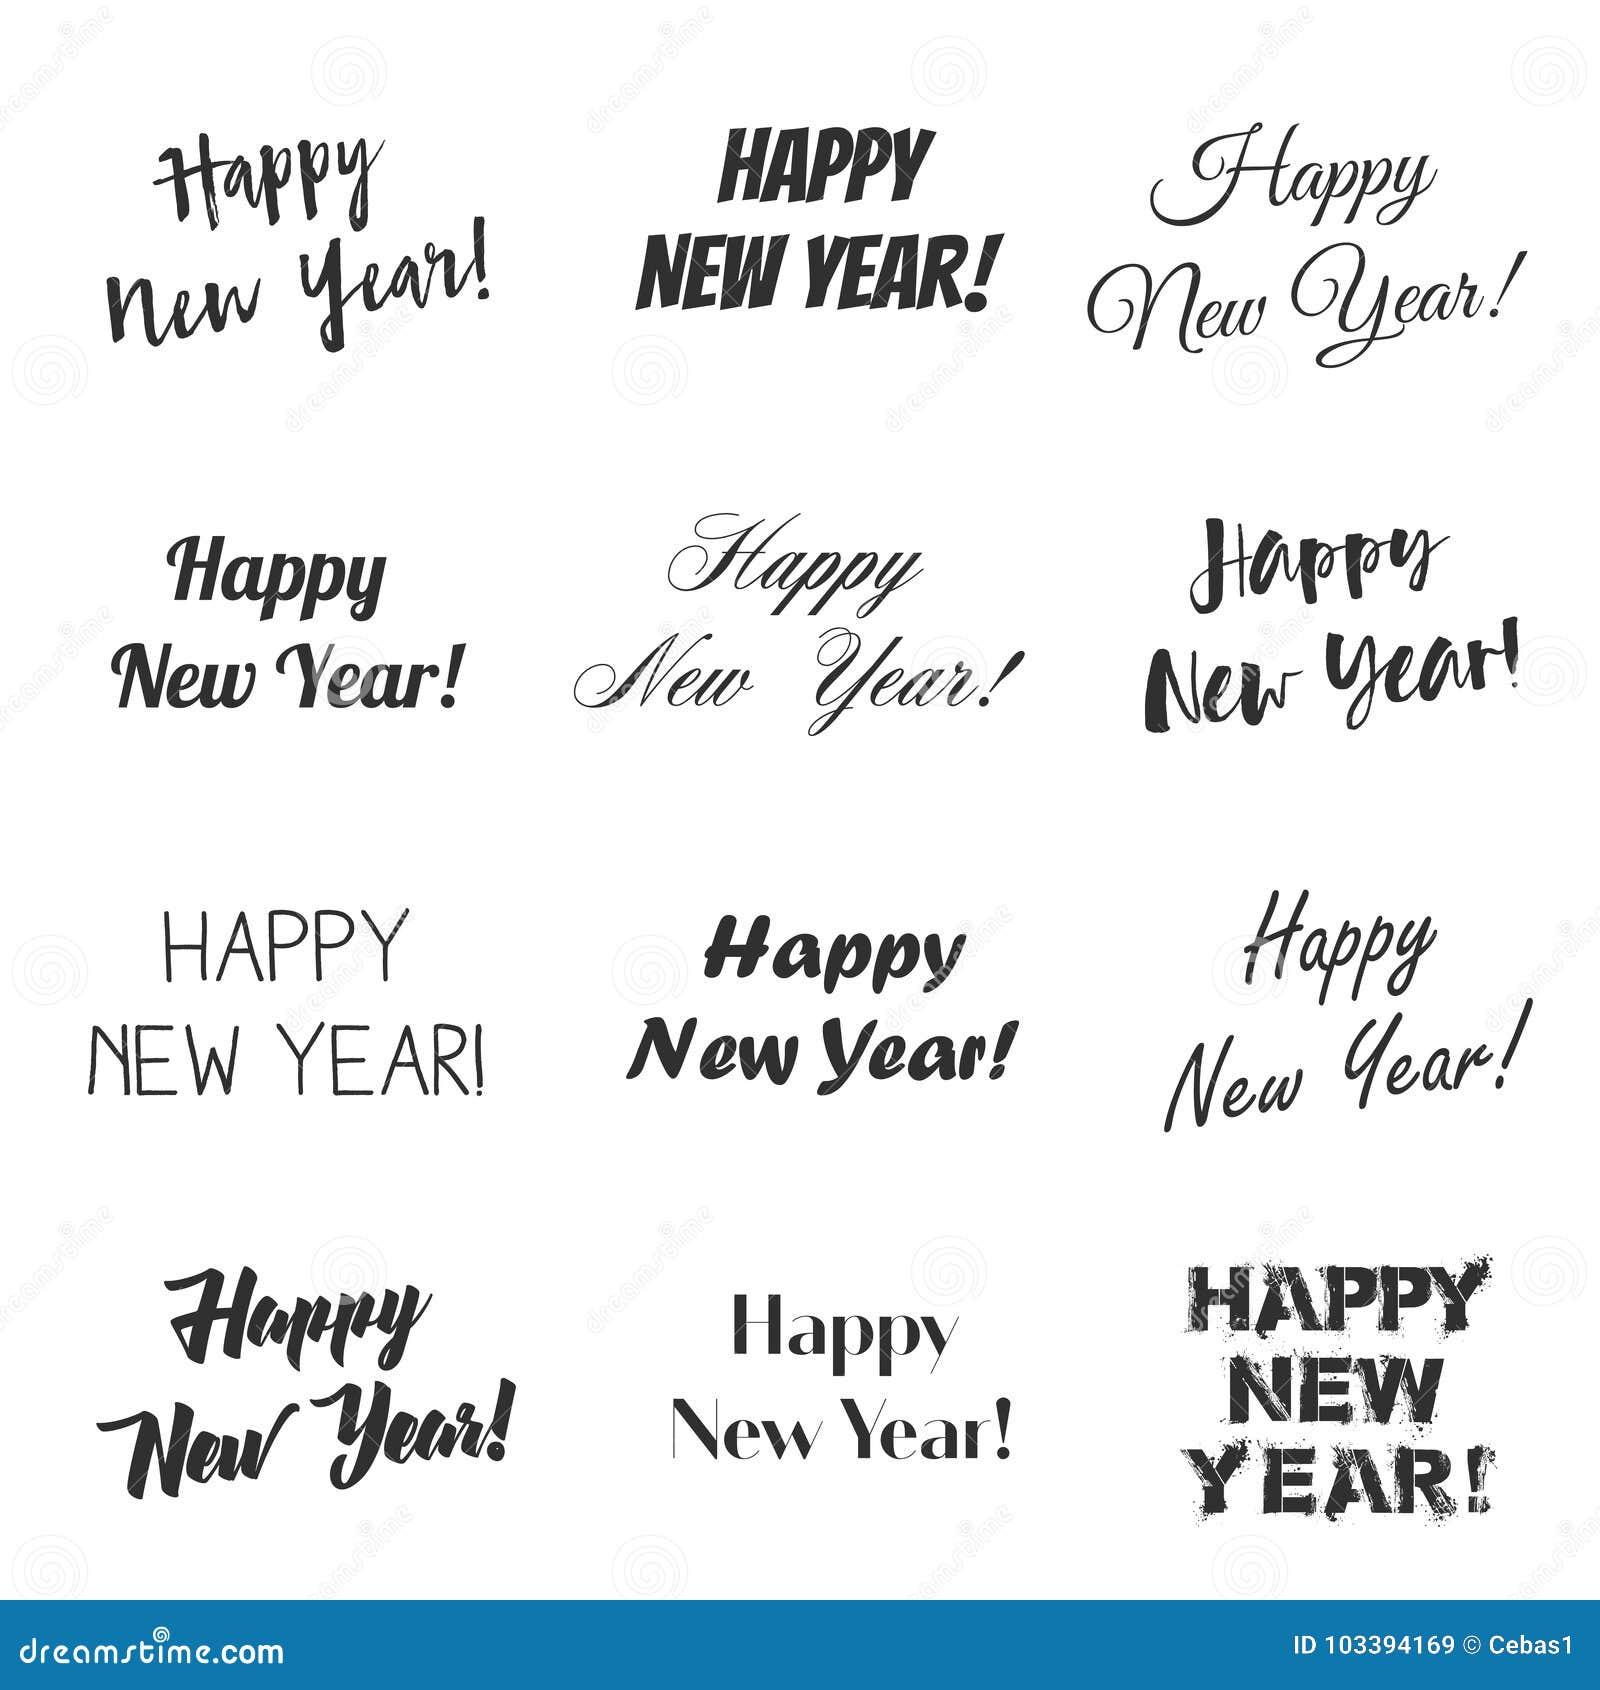 Happy New Year Greetings Vector Overlay Set Stock Vector ...